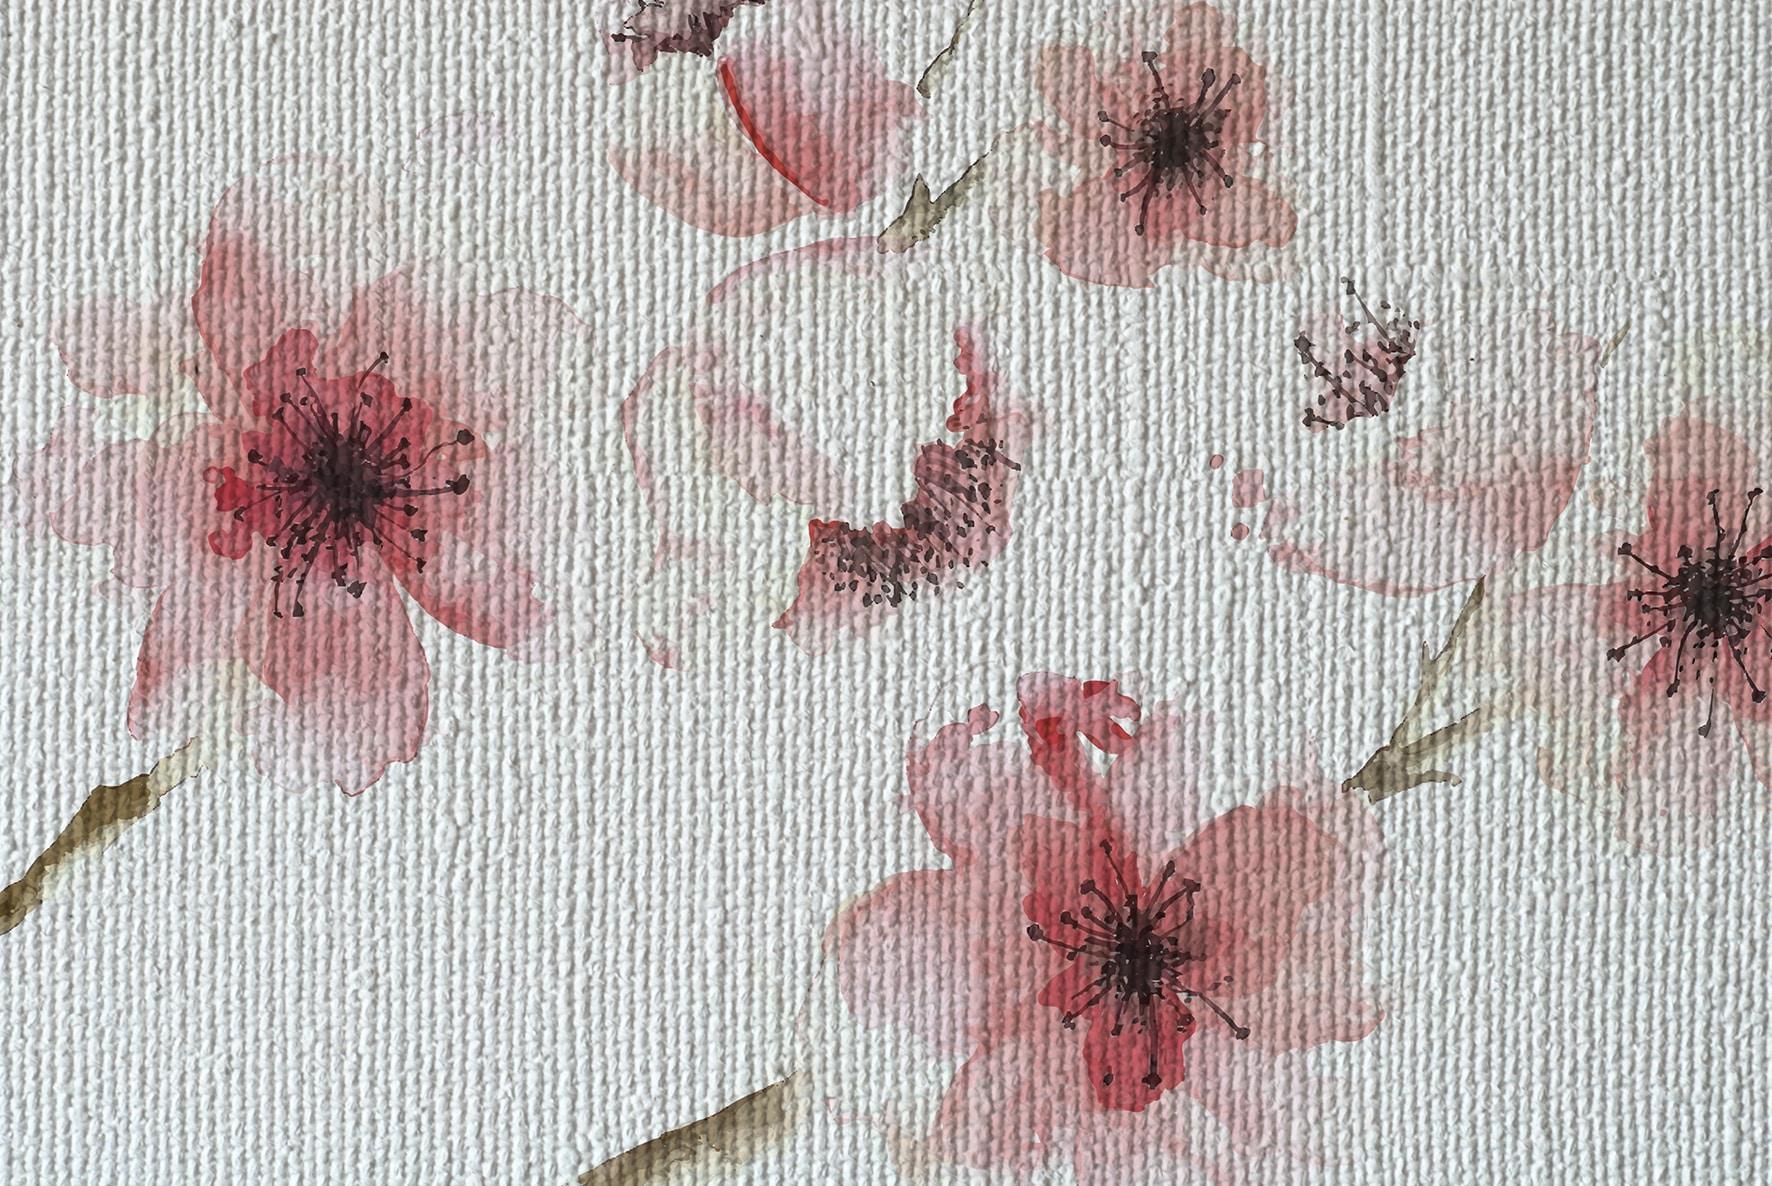 texture-parati-canvas.jpg